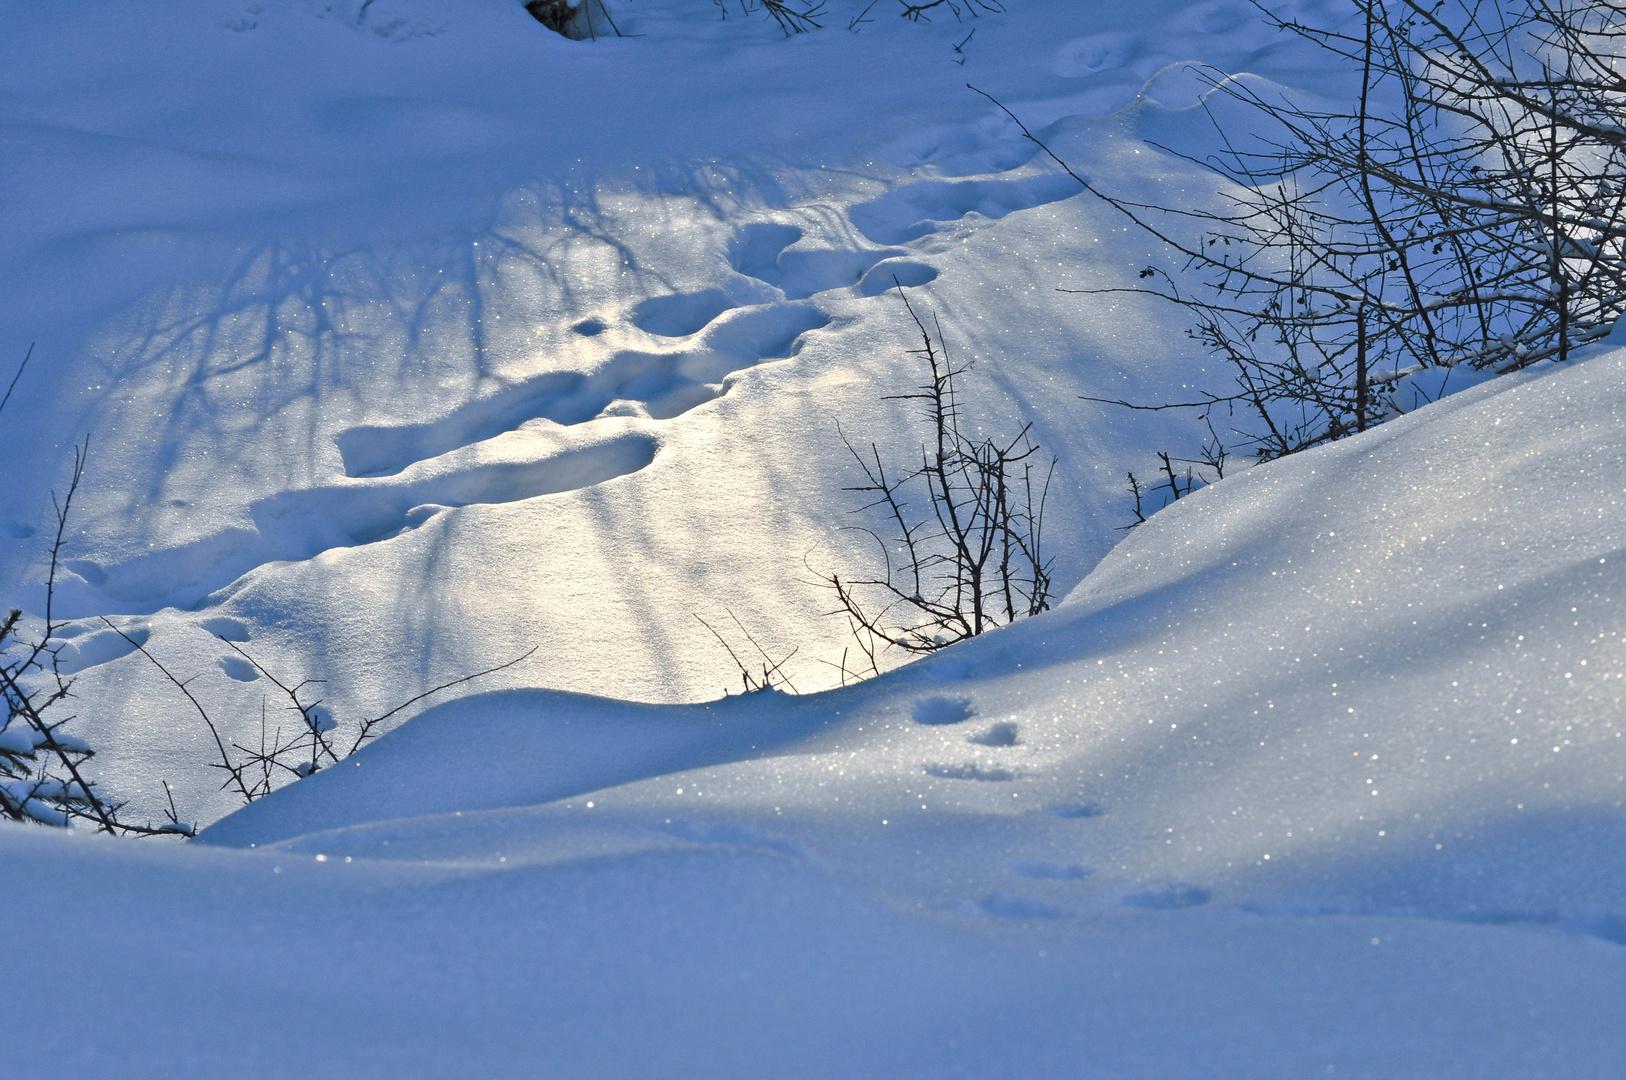 Wintertime03